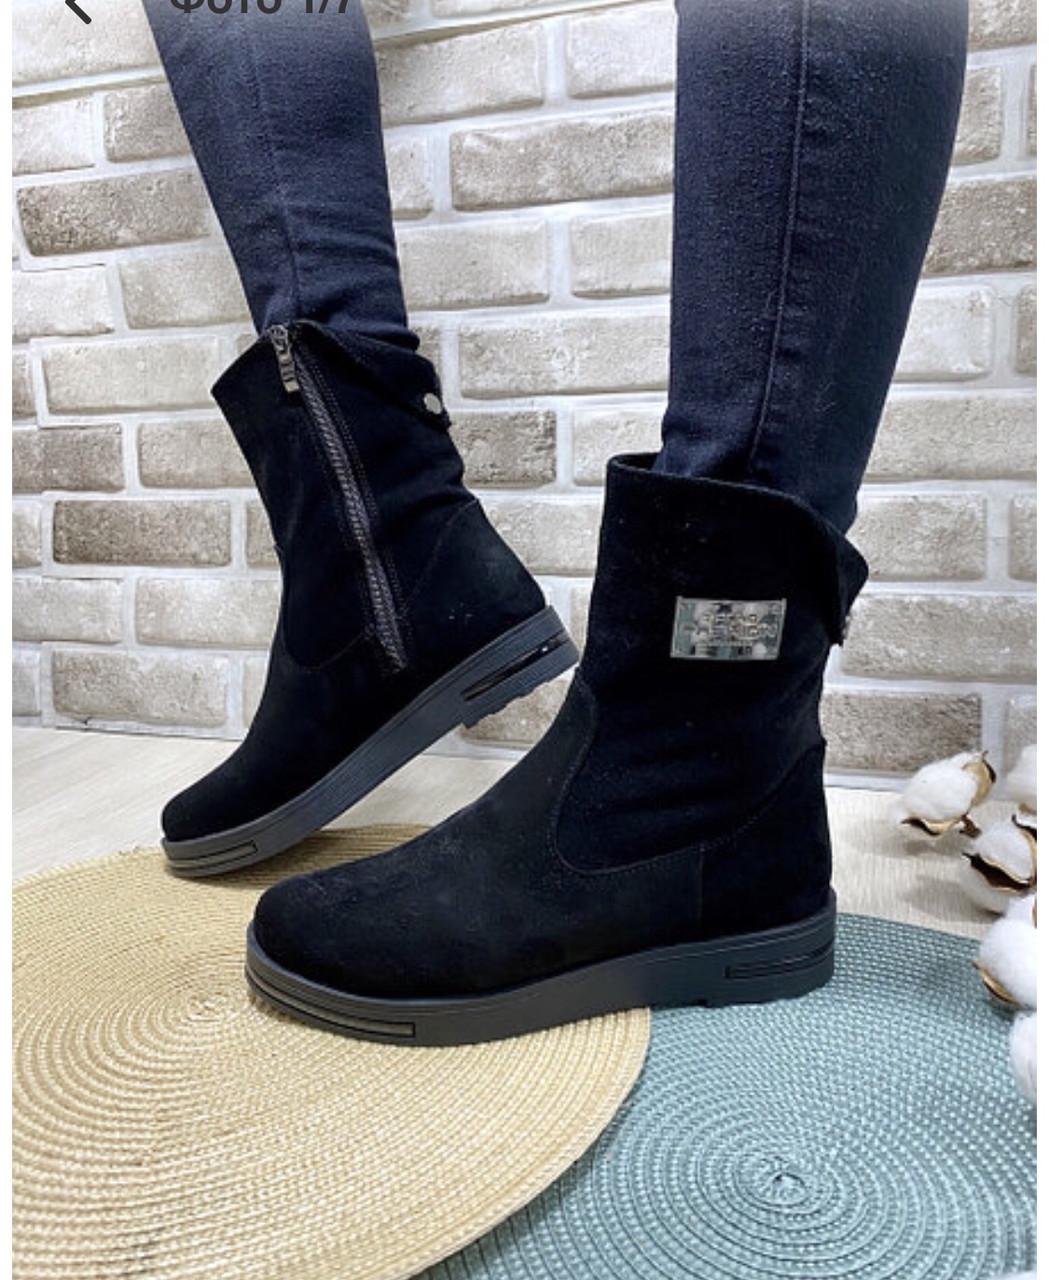 Ботинки женские зима классика замш